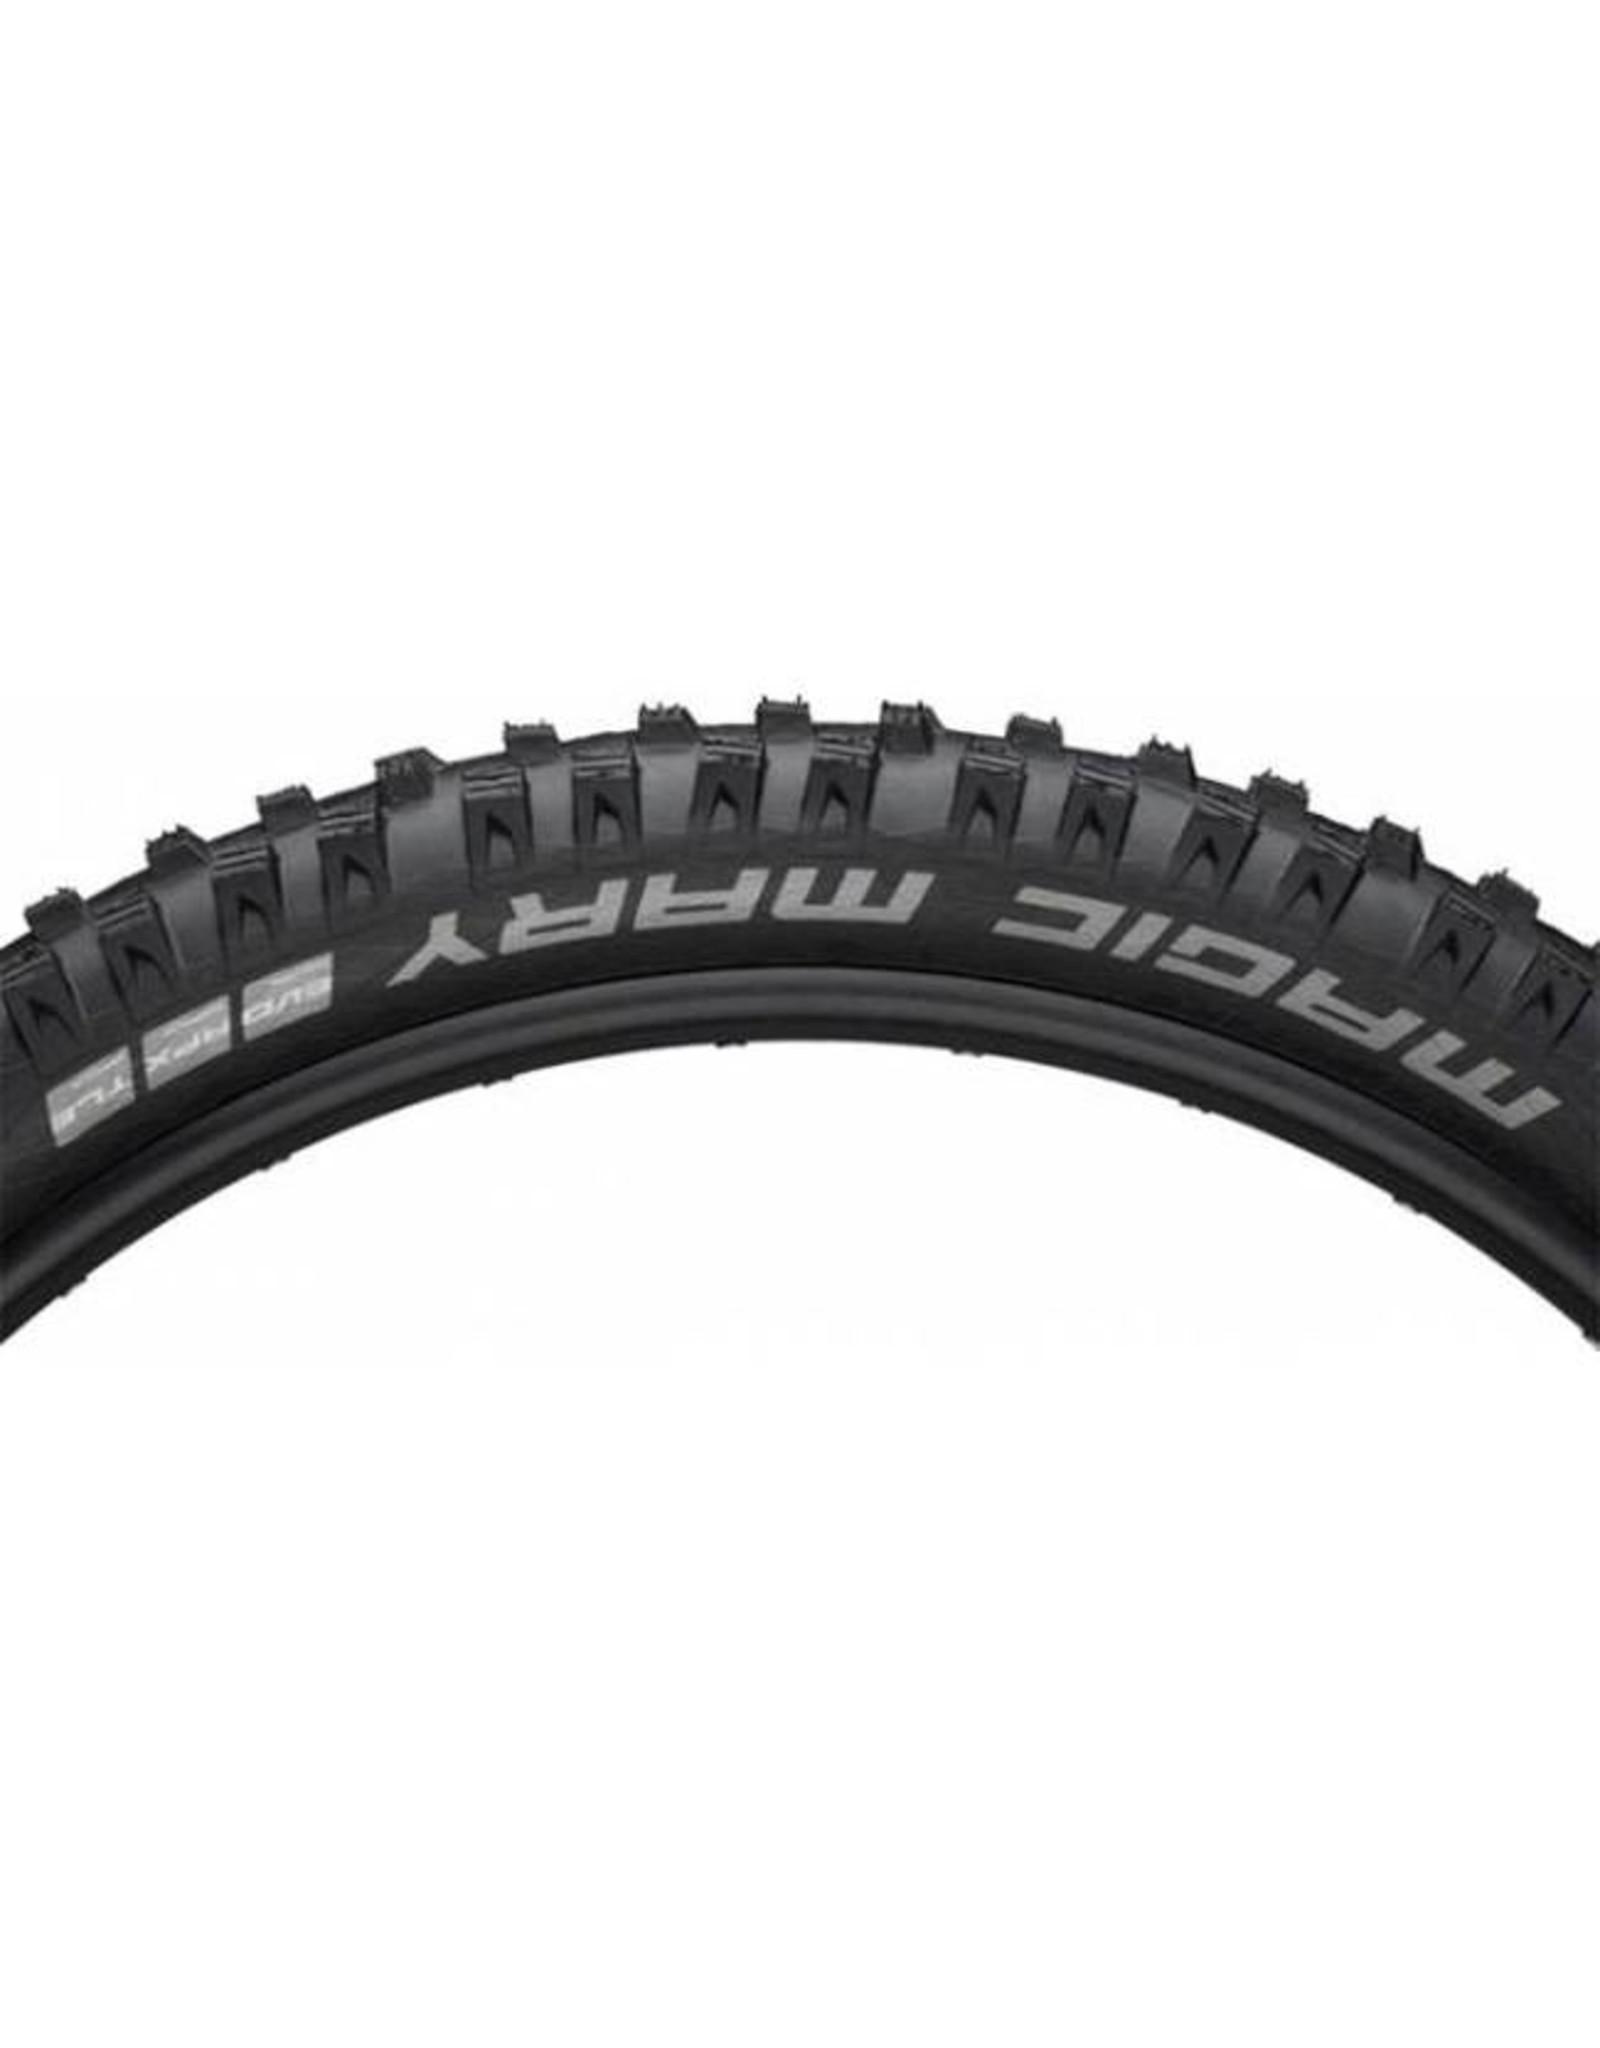 "Schwalbe Schwalbe Magic Mary Tire: 27.5 x 2.60"", Folding Bead, Evolution Line, Addix Soft Compound, SnakeSkin, Tubeless Easy, Apex, Black"